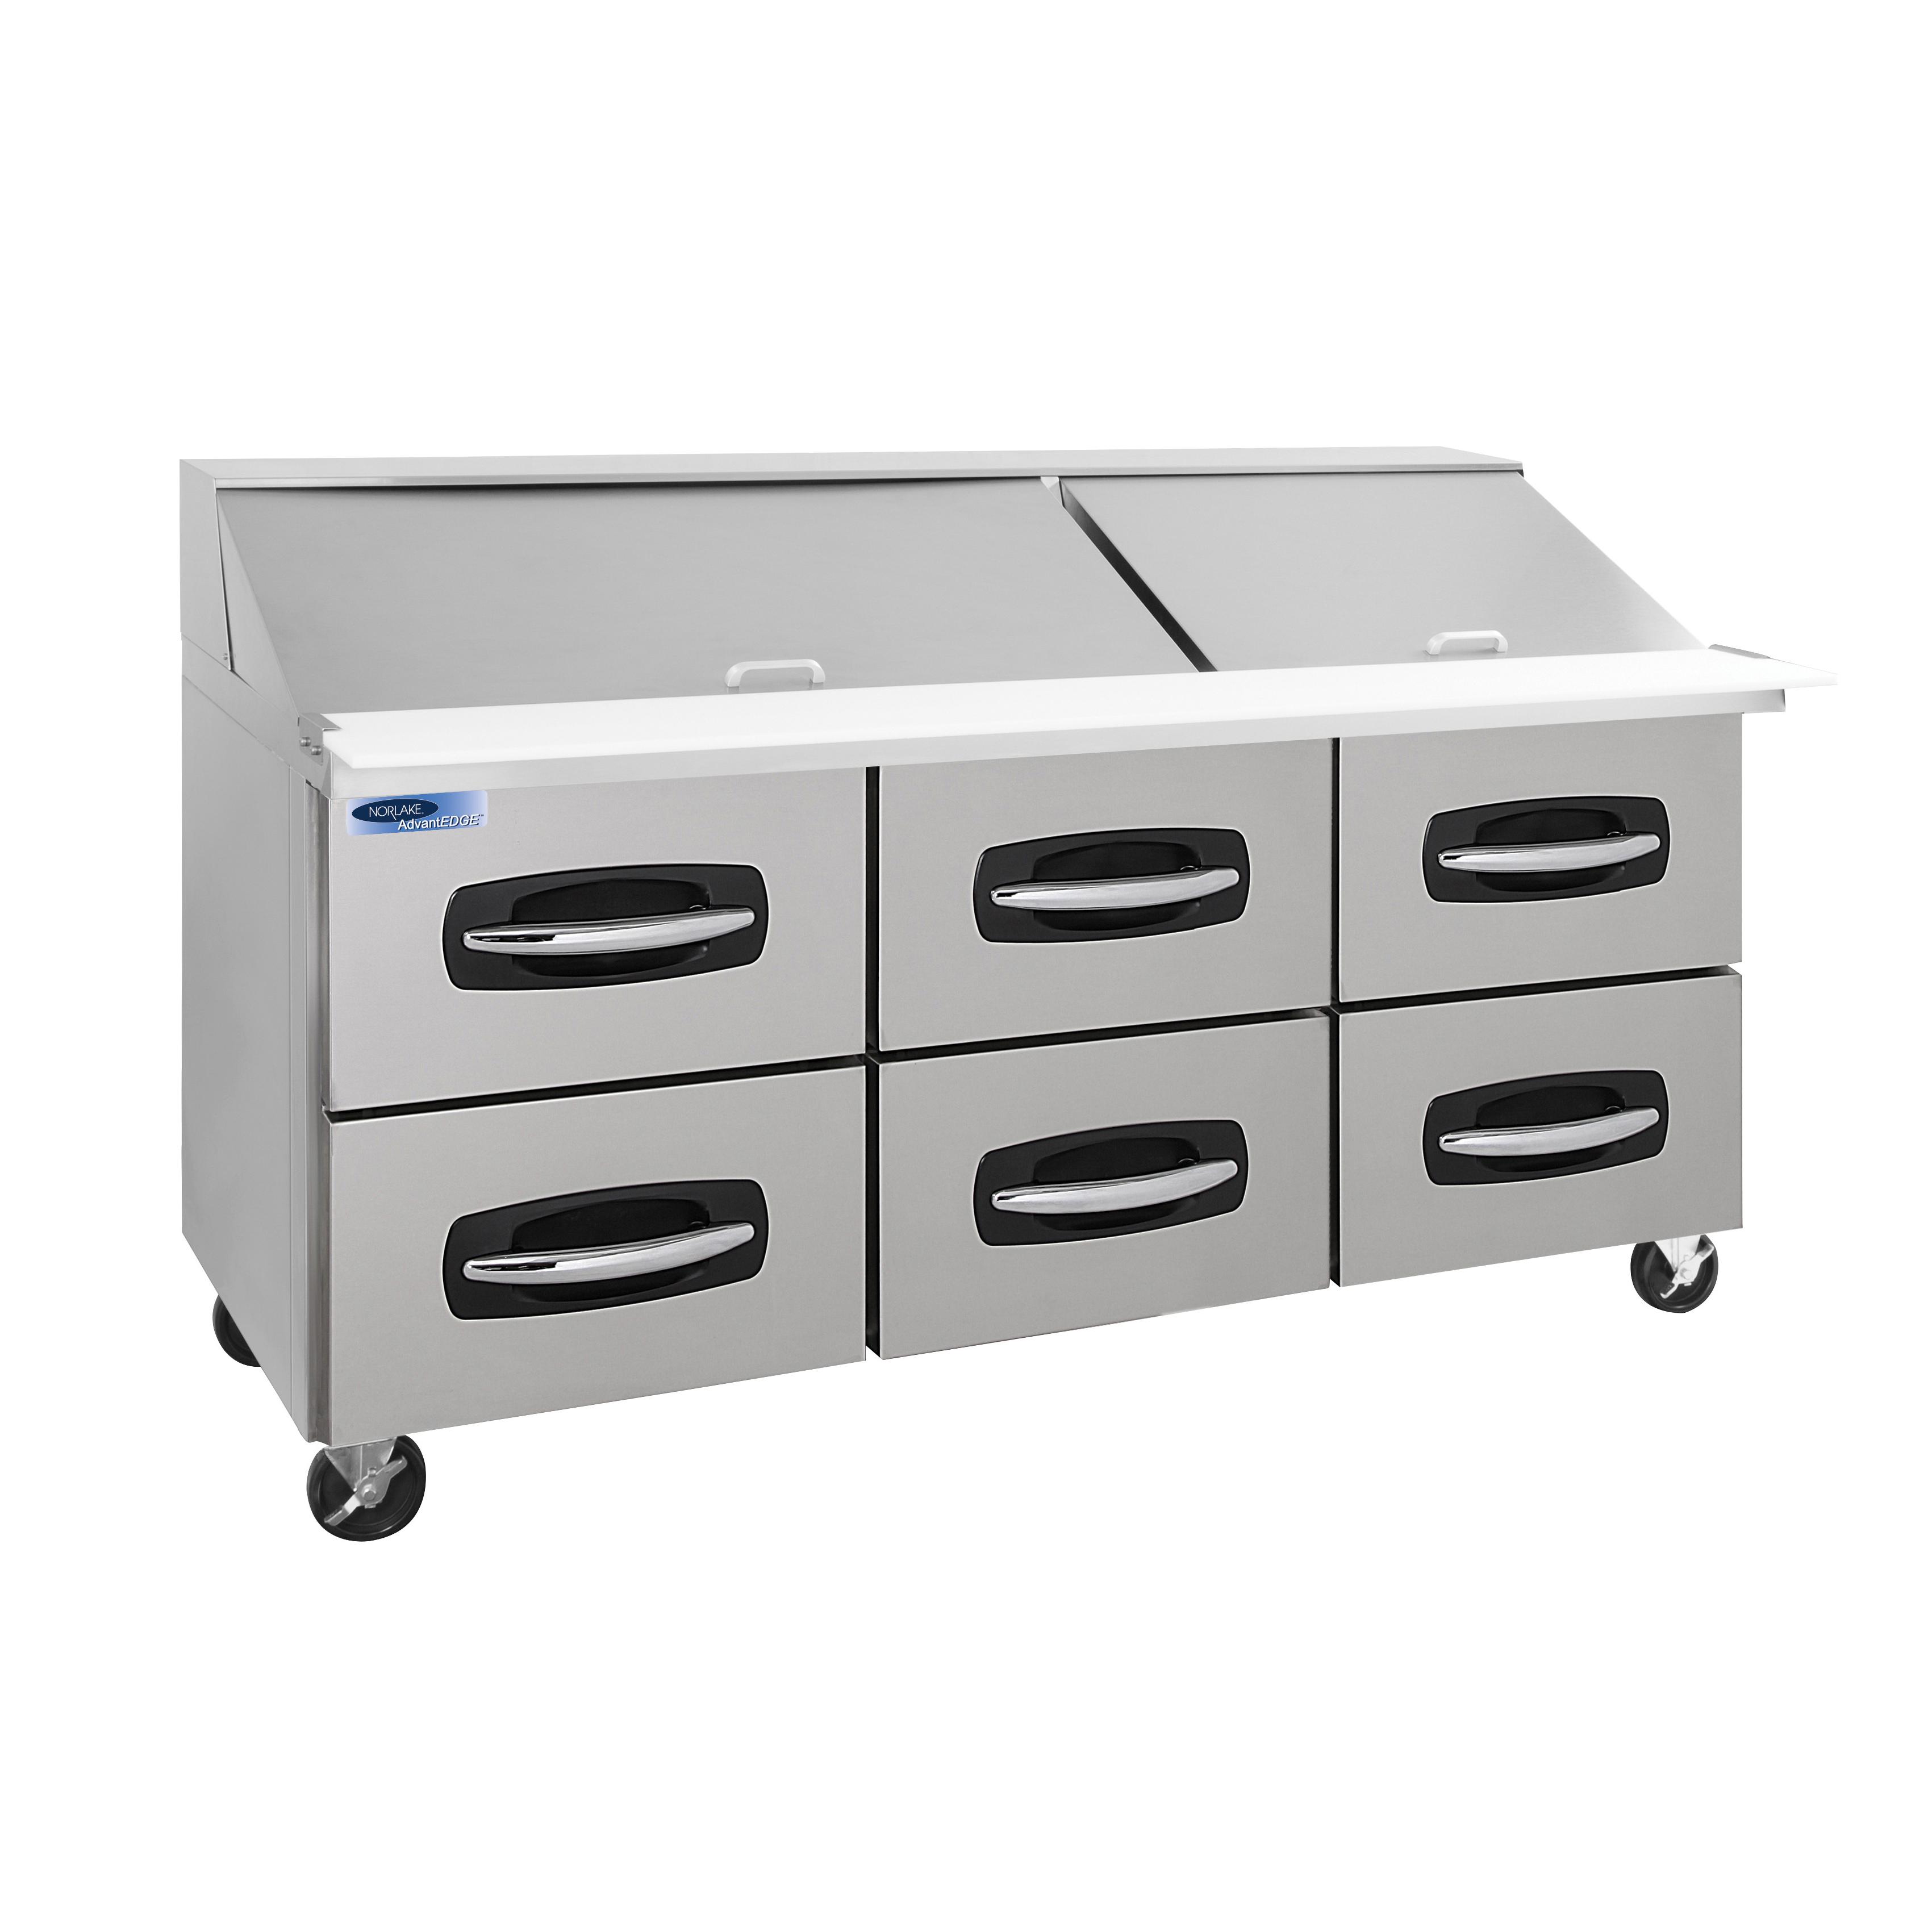 Nor-Lake NLSMP72-30A-001B refrigerated counter, mega top sandwich / salad unit